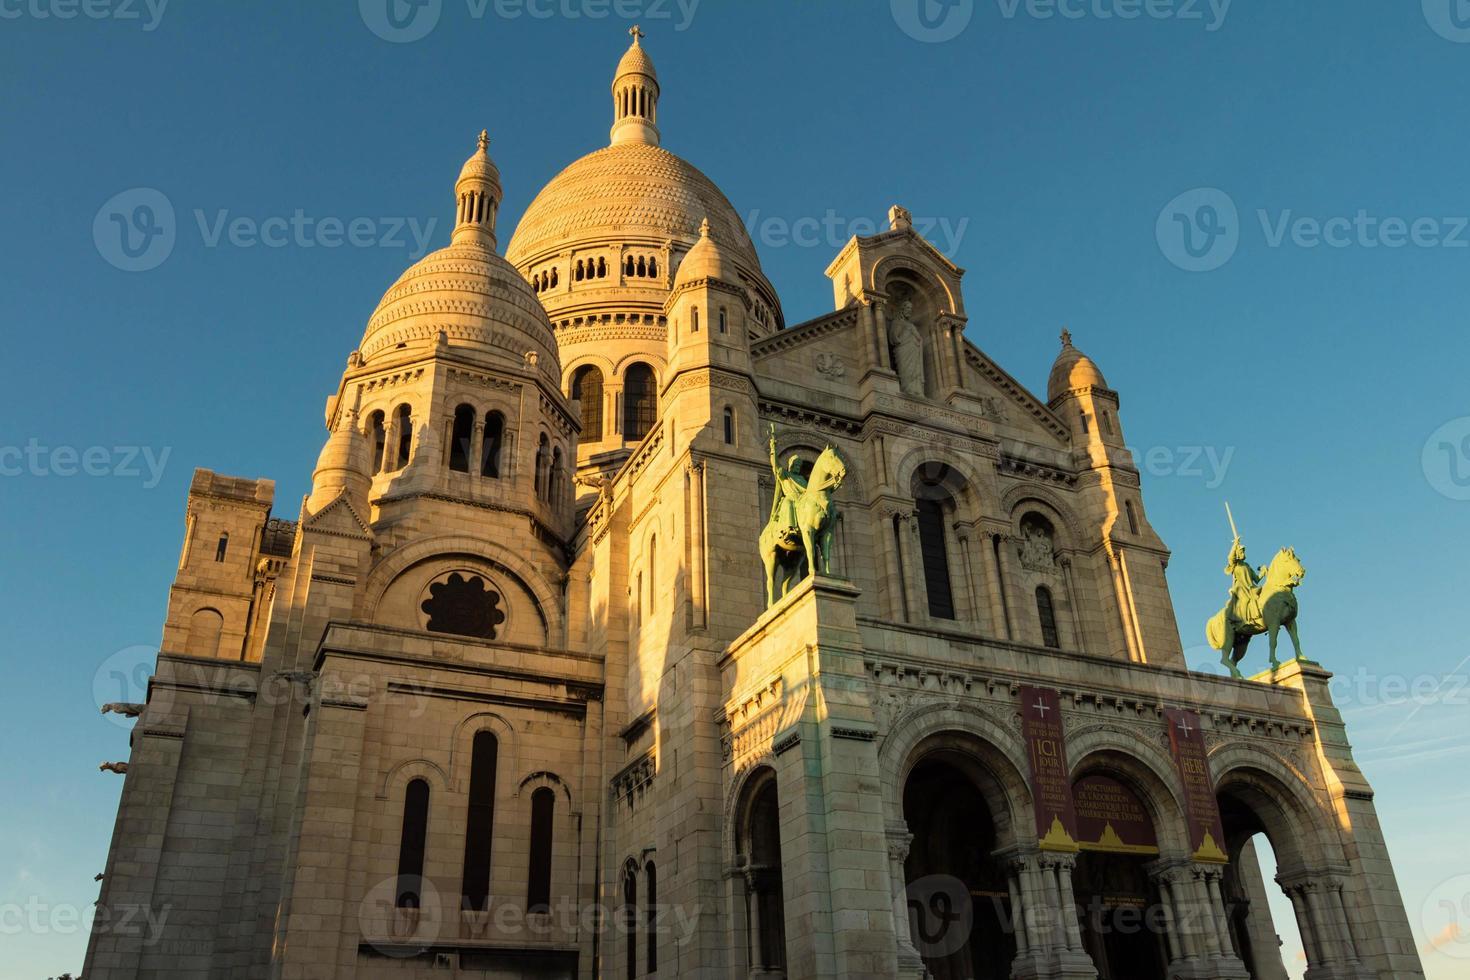 die basilica sacre coeur, paris, frankreich. foto